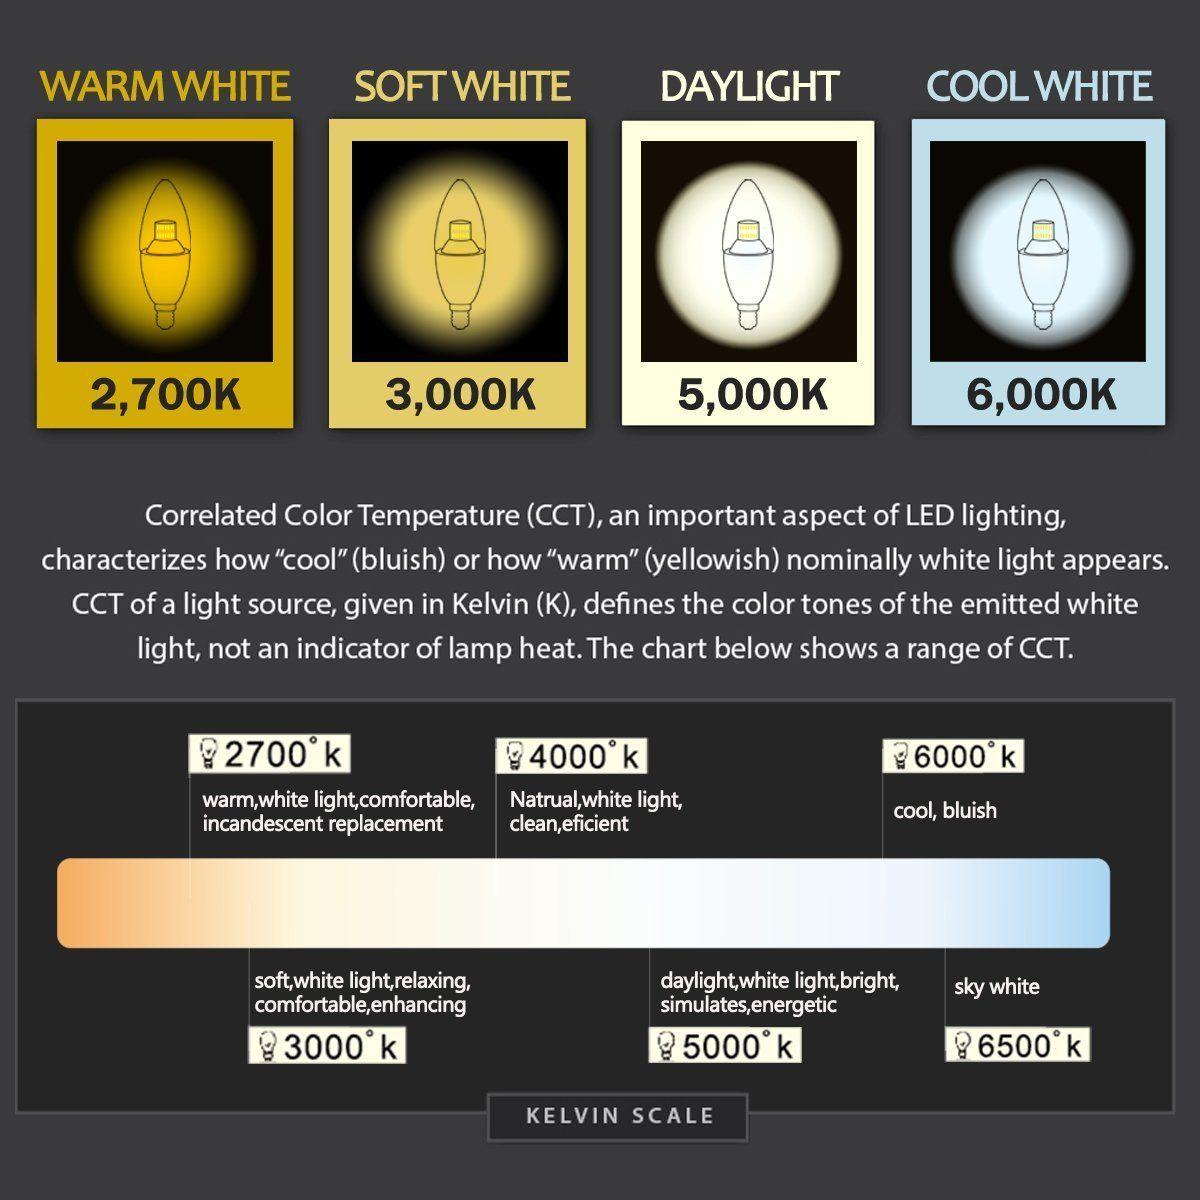 Led Energy Saving Corn Lamp Light Bulbs Daylight E26 5000 Lm Daylight 6500k Cool Whiteroom Ledbulbs Lamps Plus Outdoor Garage Lights Led Candelabra Bulbs Bulb